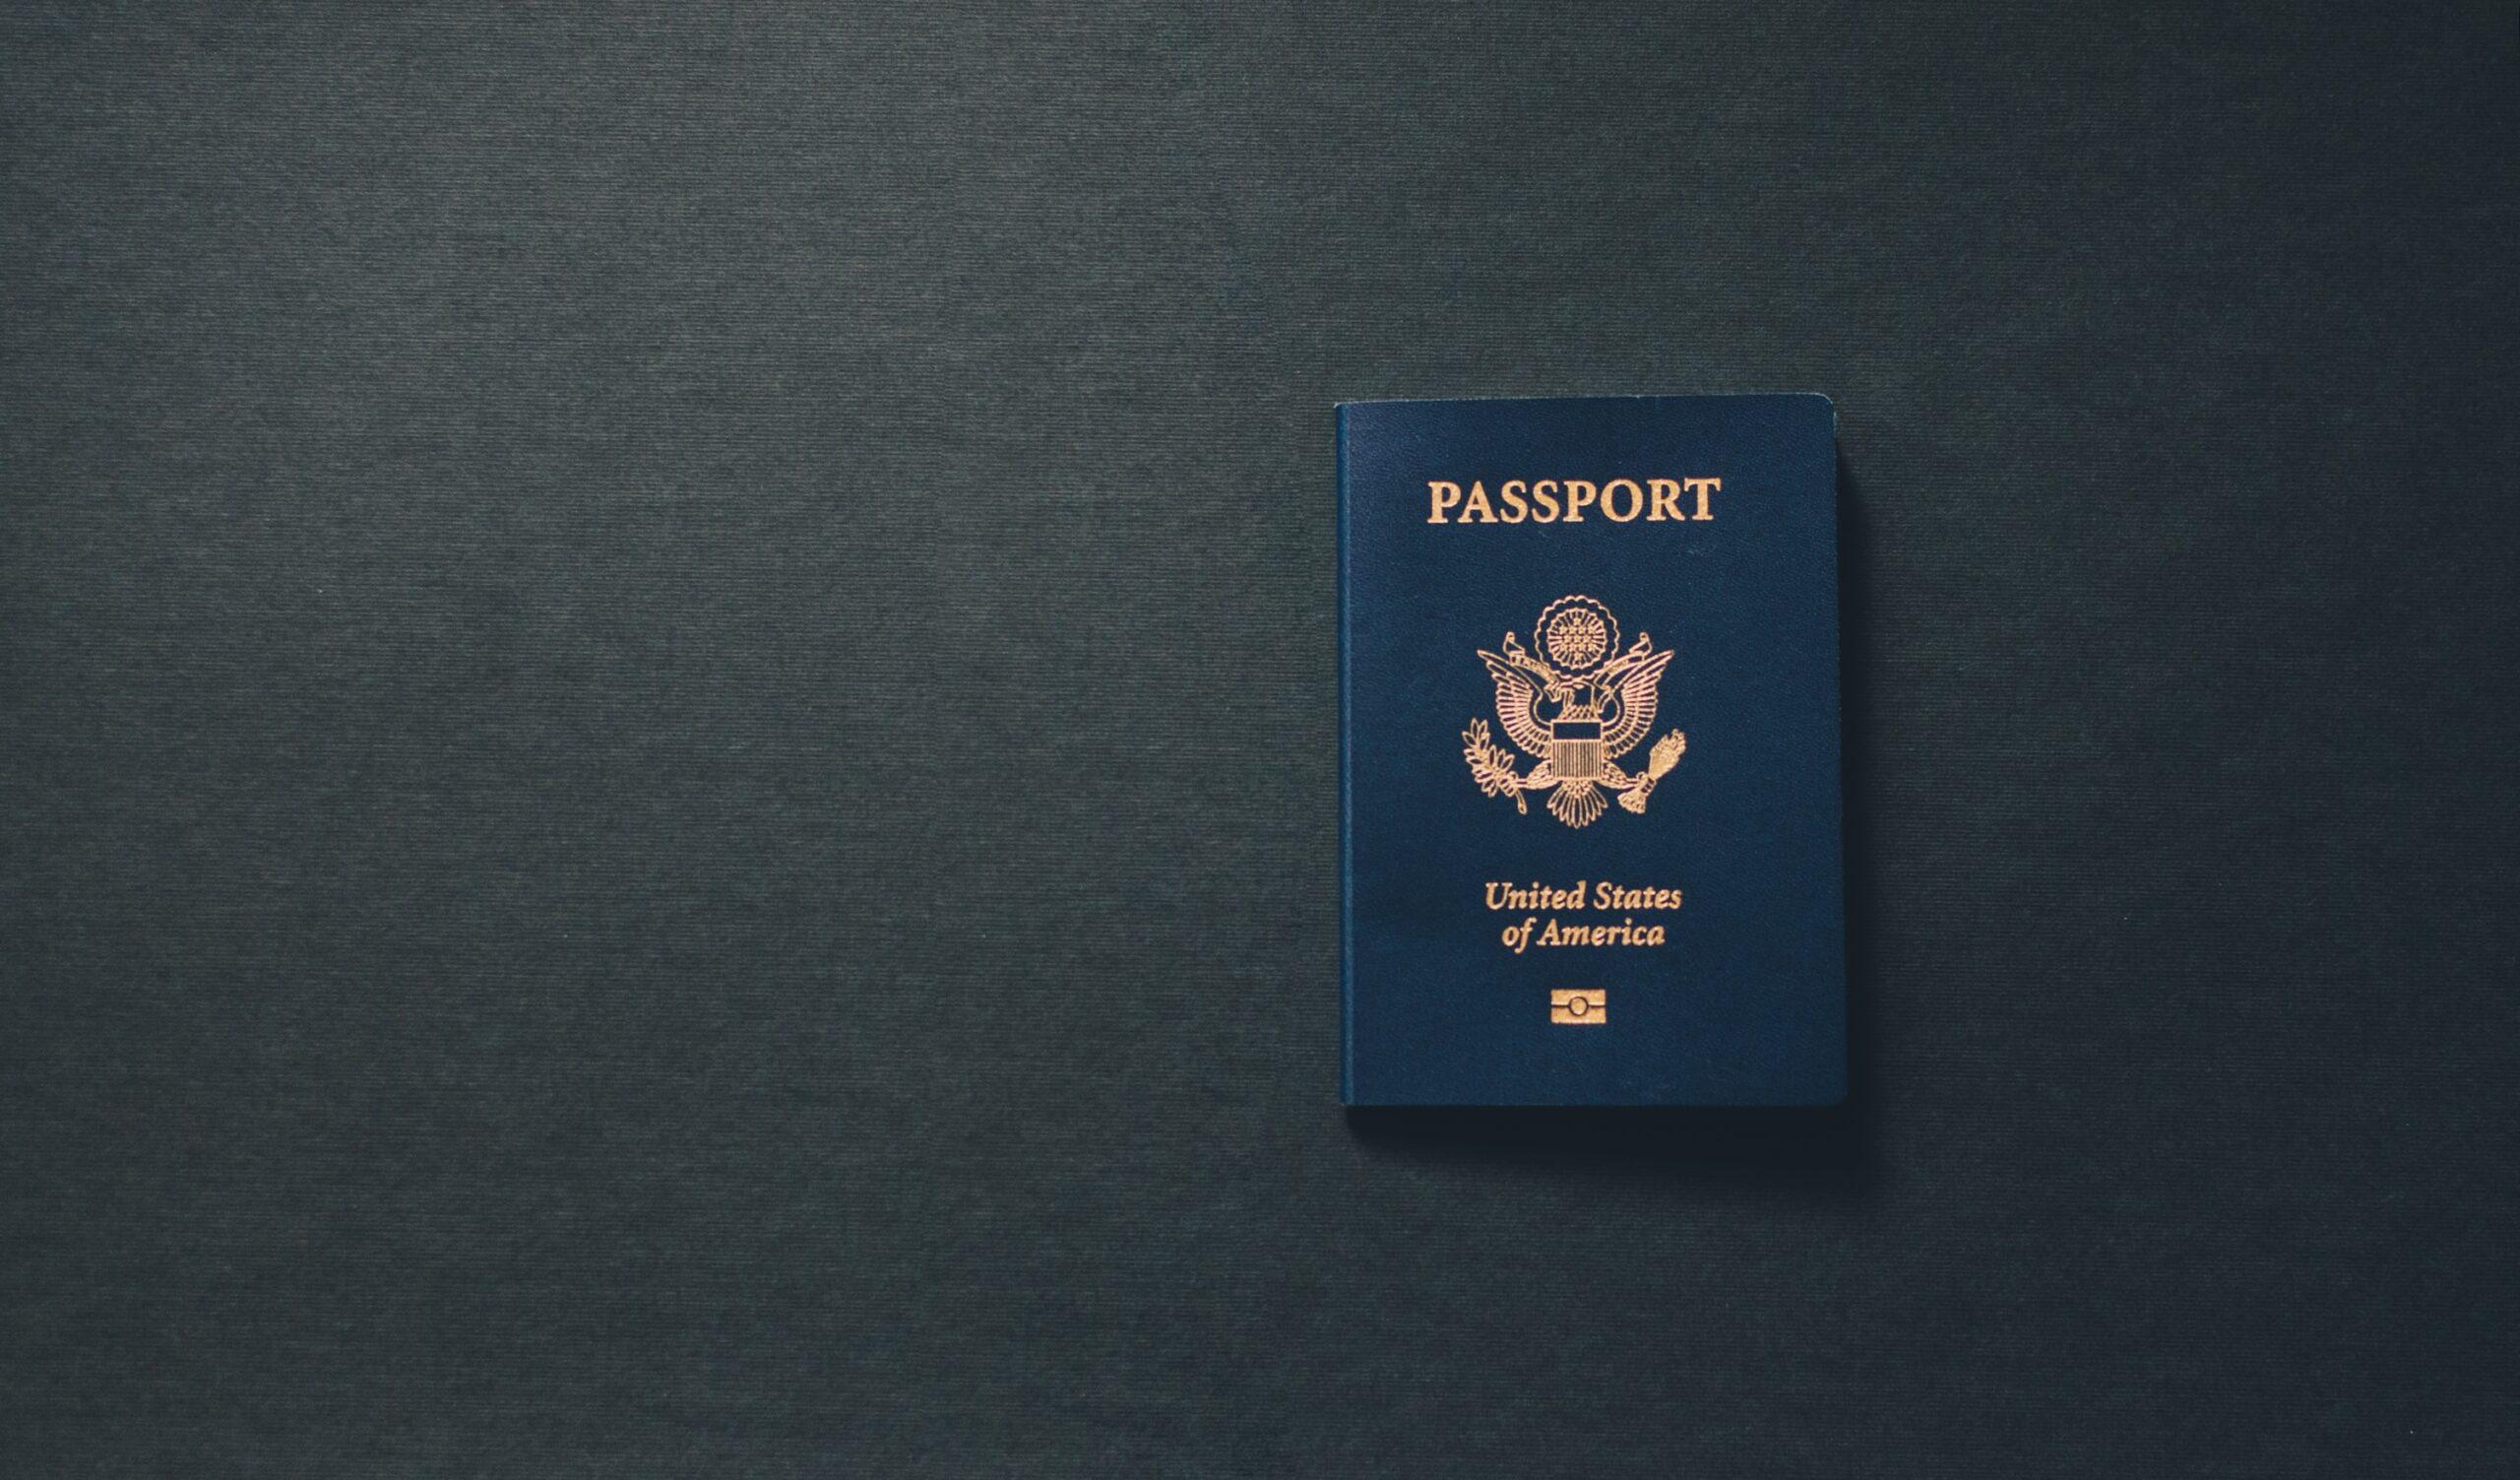 U S Passport Crba And Travel Information For U S Citizens Following The Coronavirus Covid 19 Pandemic U S Embassy Consulates In The United Kingdom